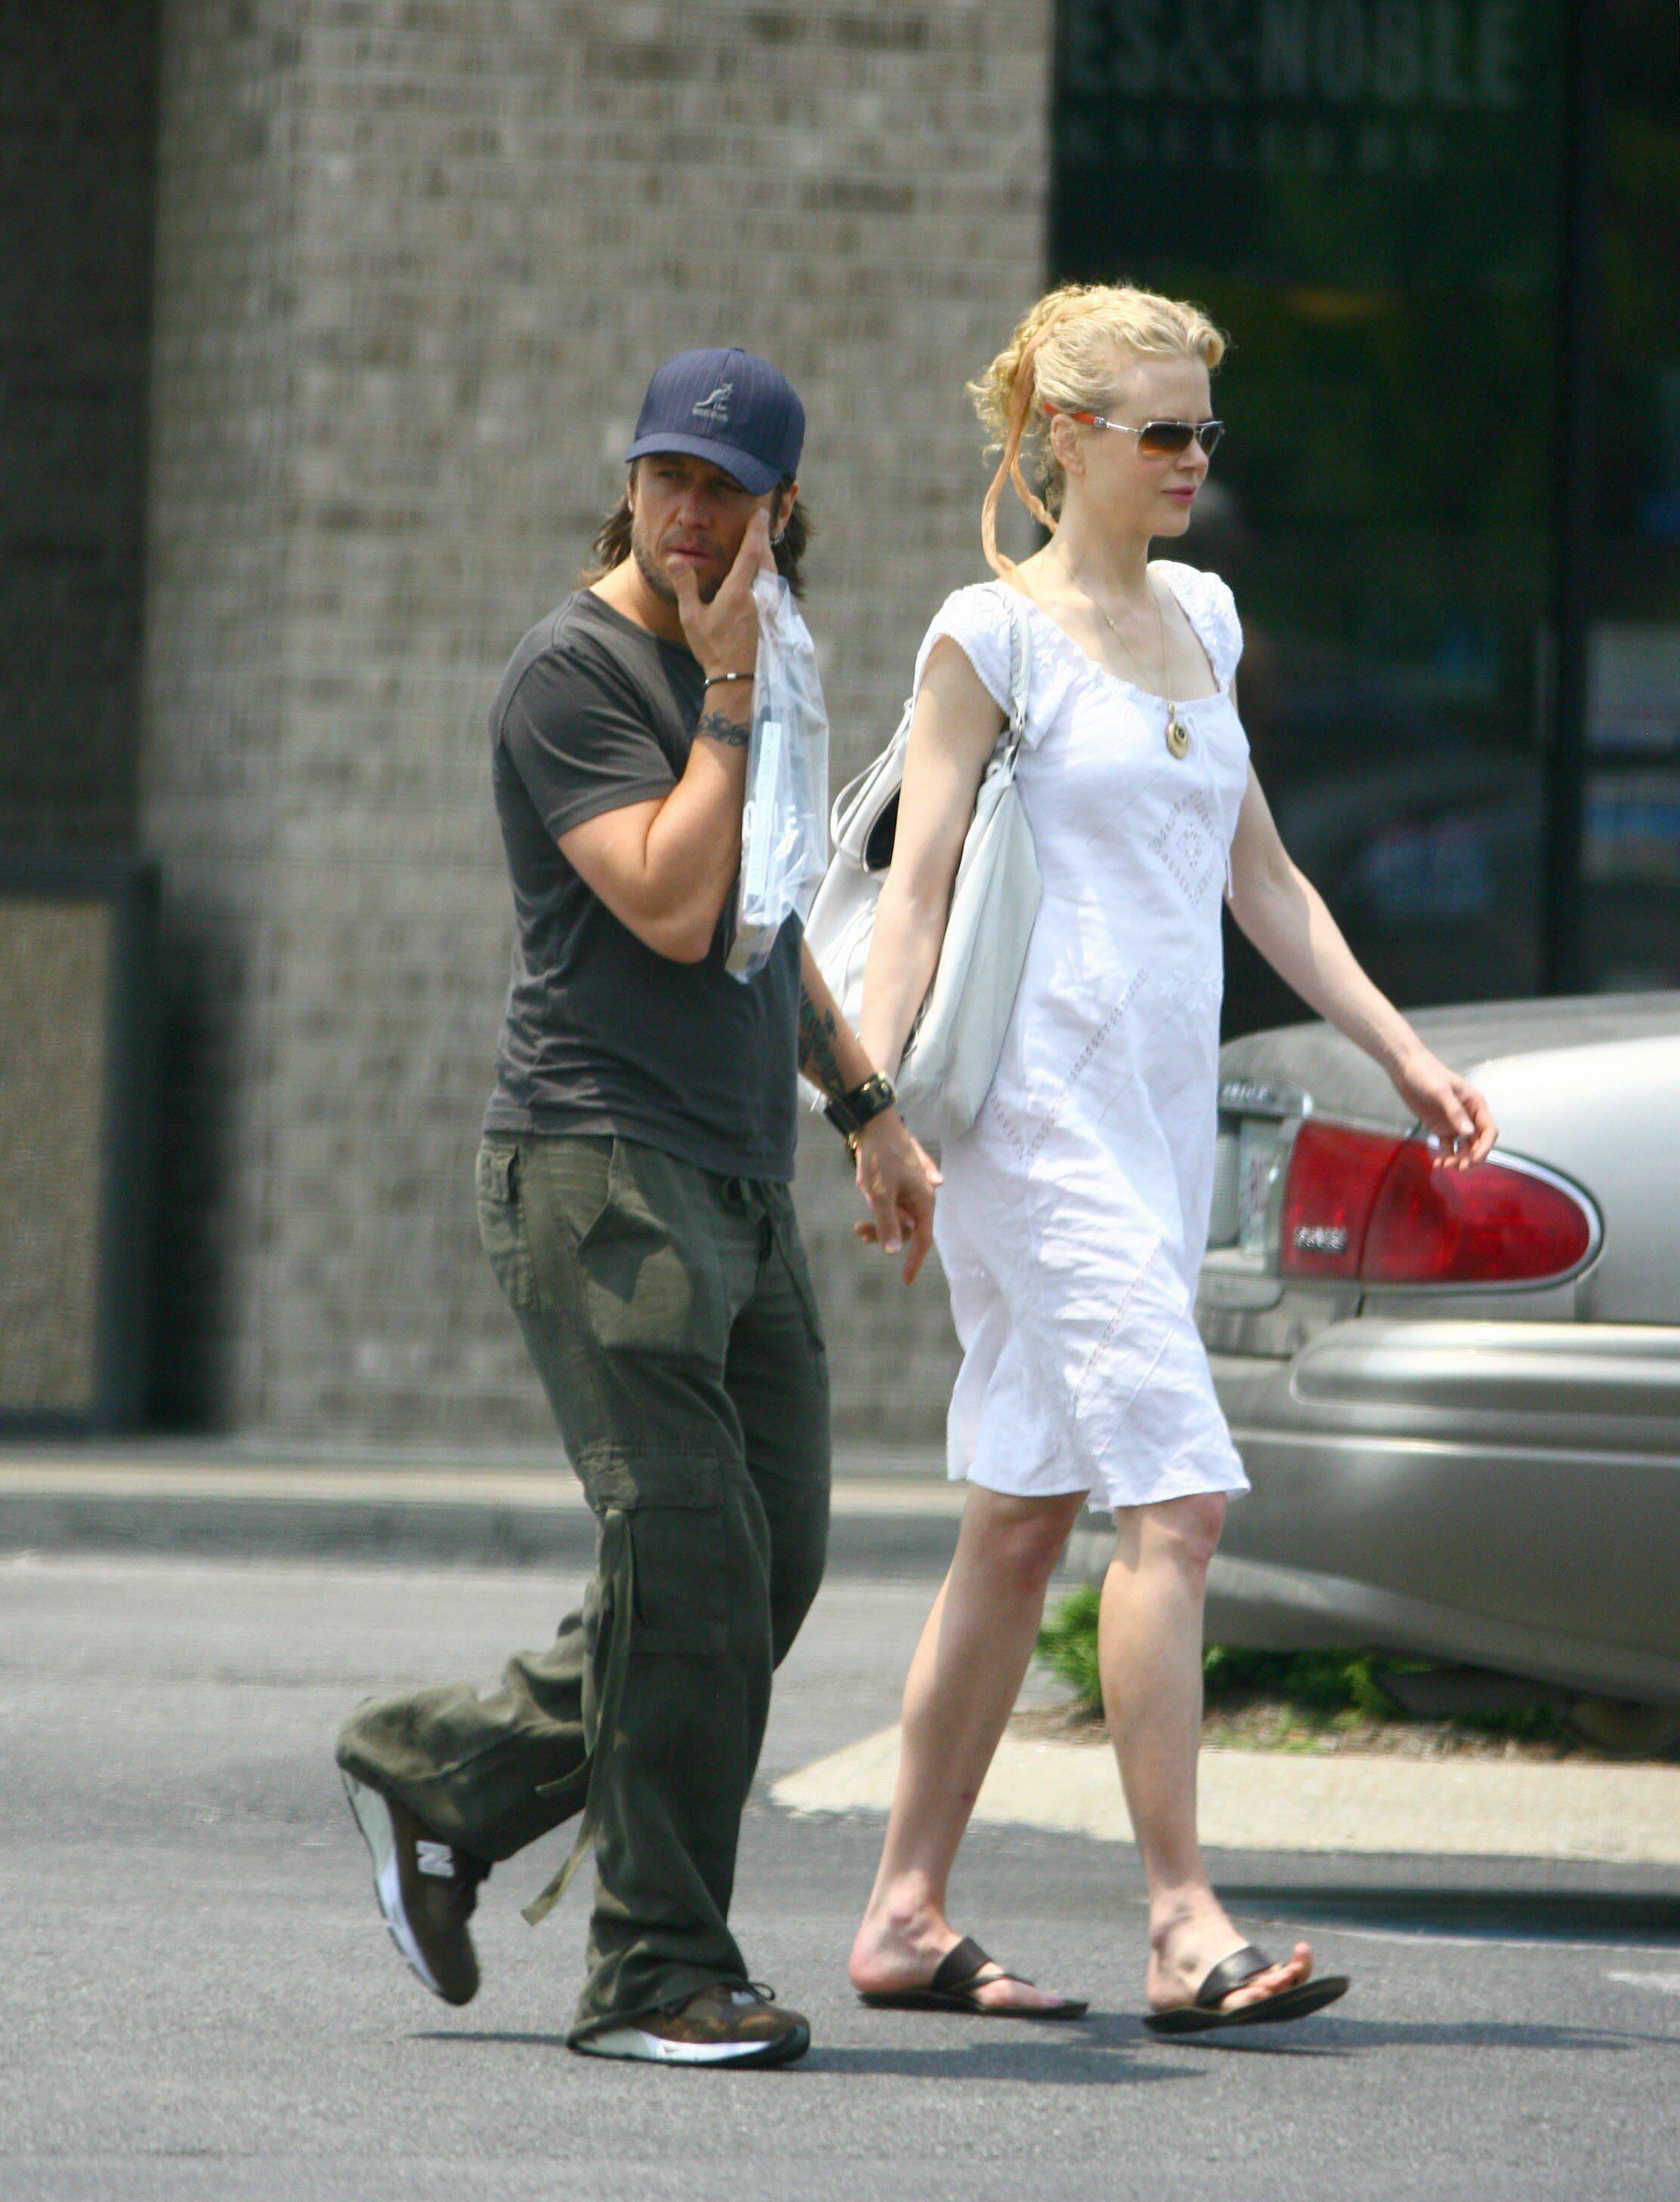 25823_Nicole_Kidman_and_Keith_Urban_buy_a_book_in_Nashville_06_352lo.jpg